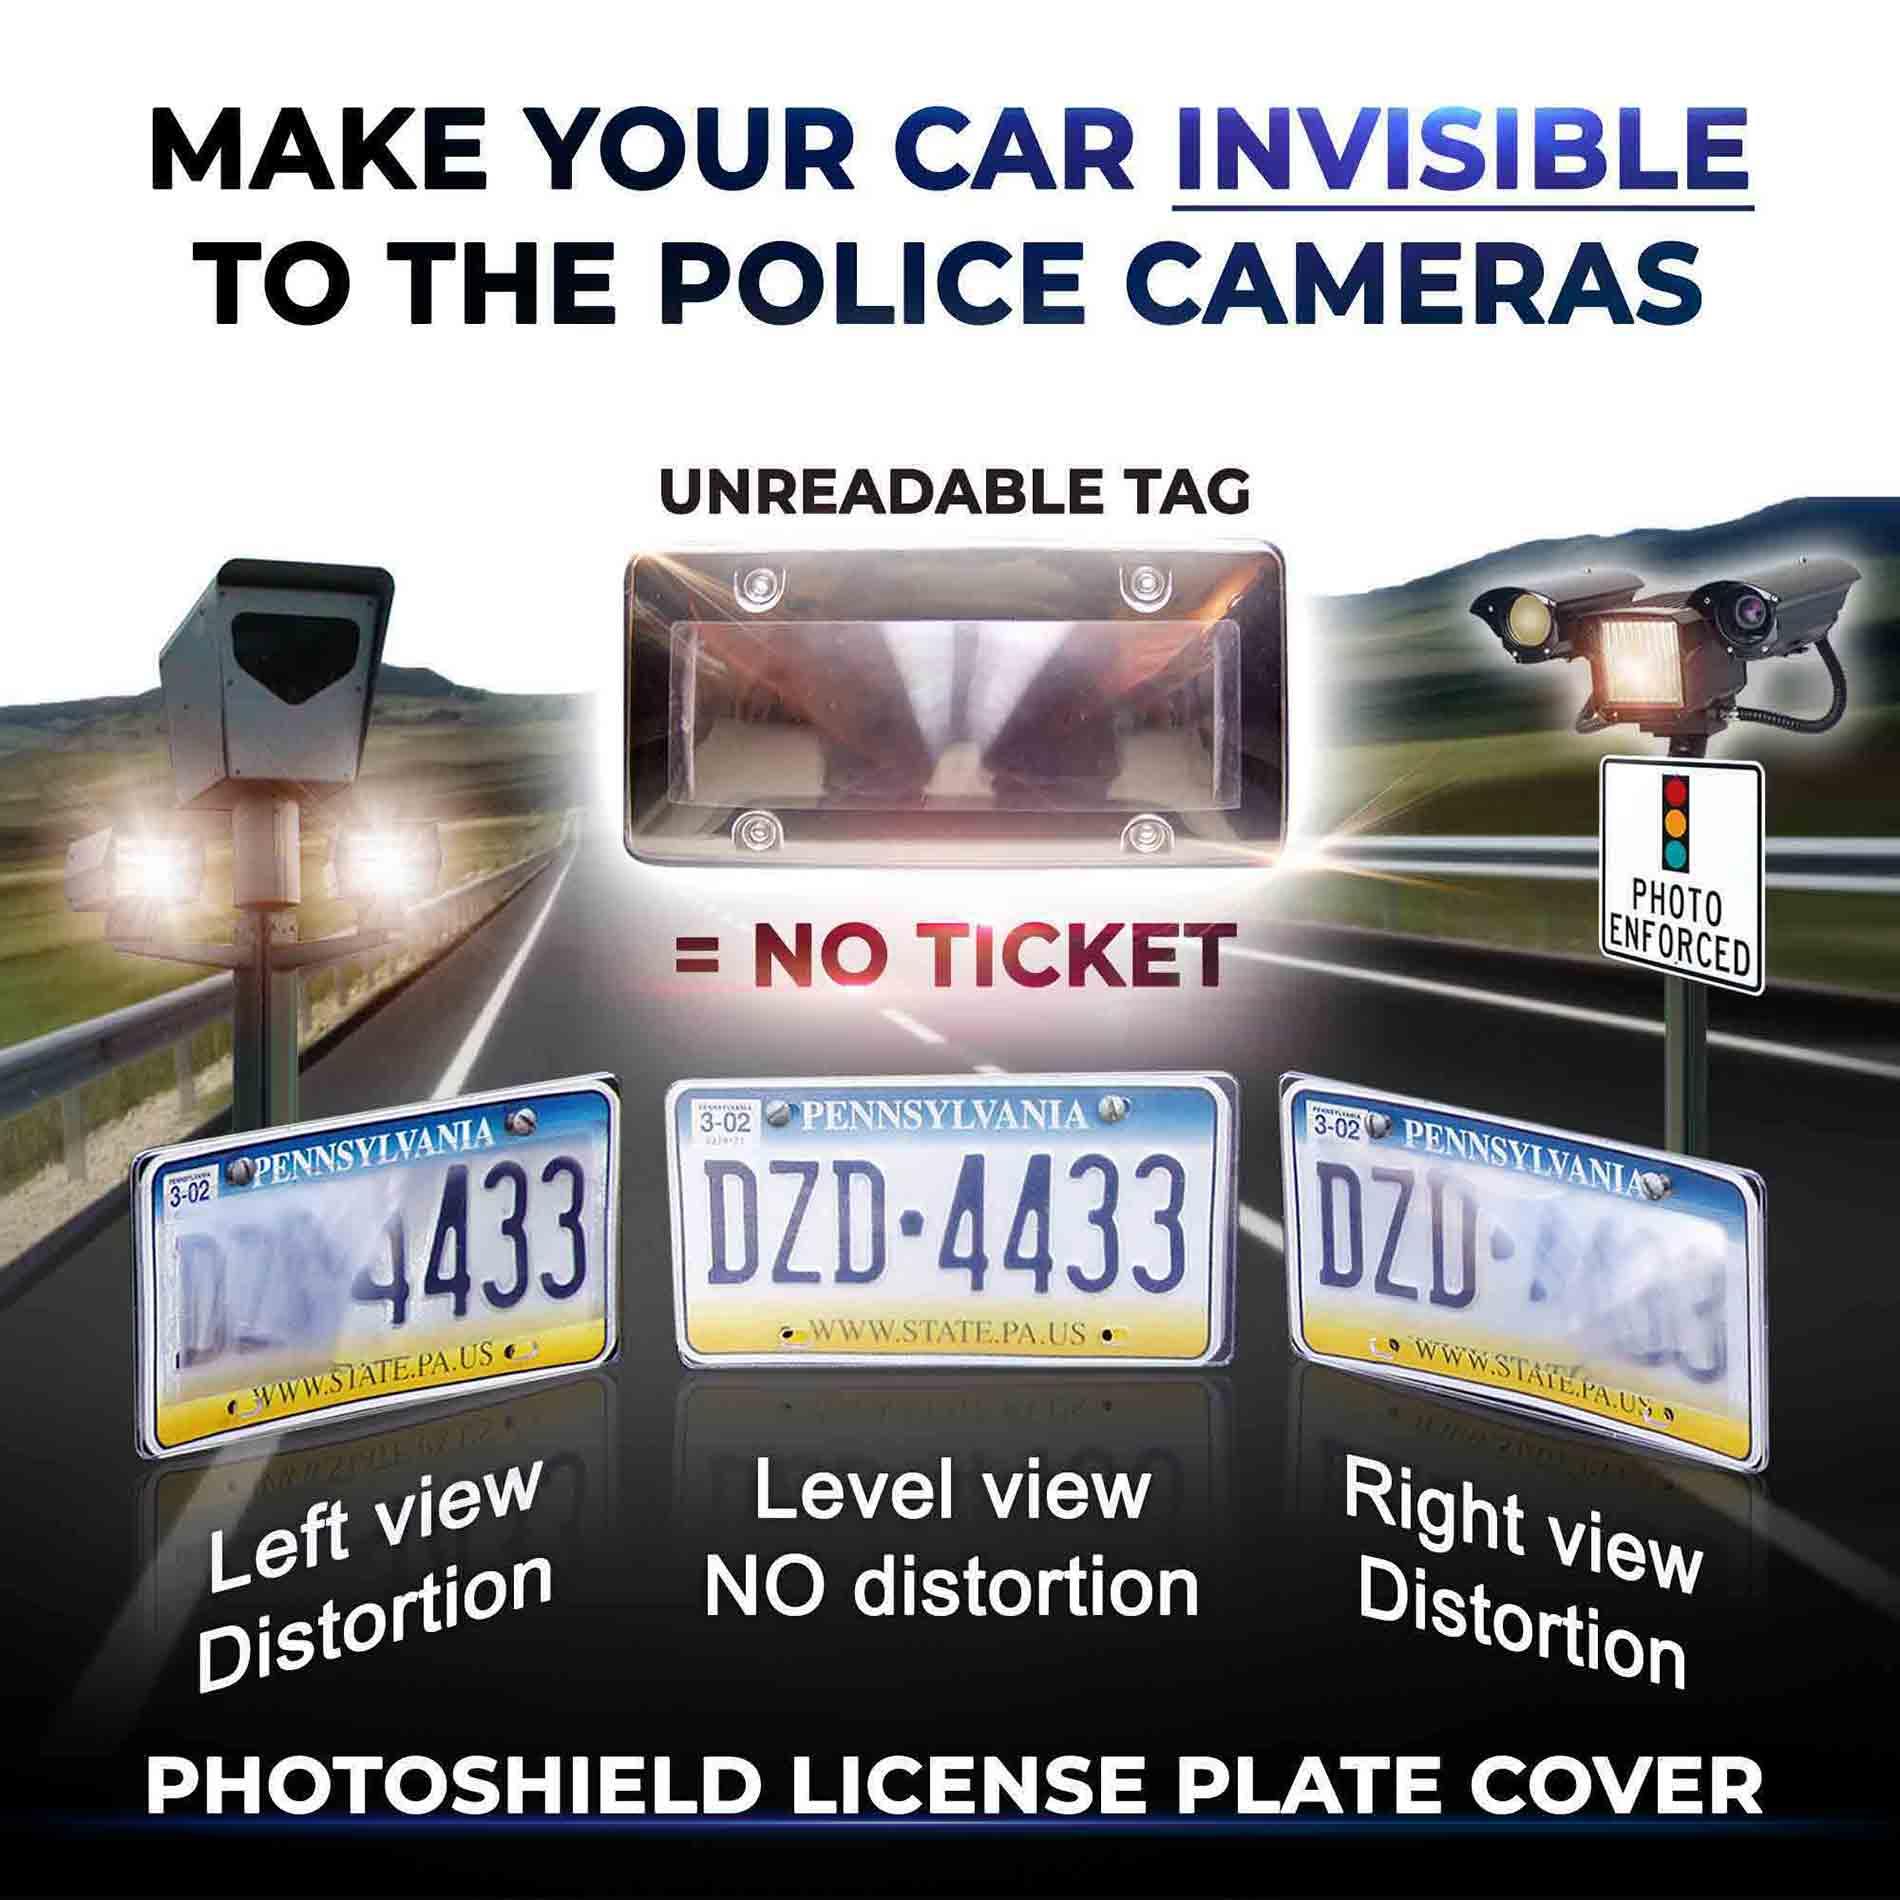 PhotoShield License Plate Cover Anti Speed Camera Cover Tapaffiliate v2